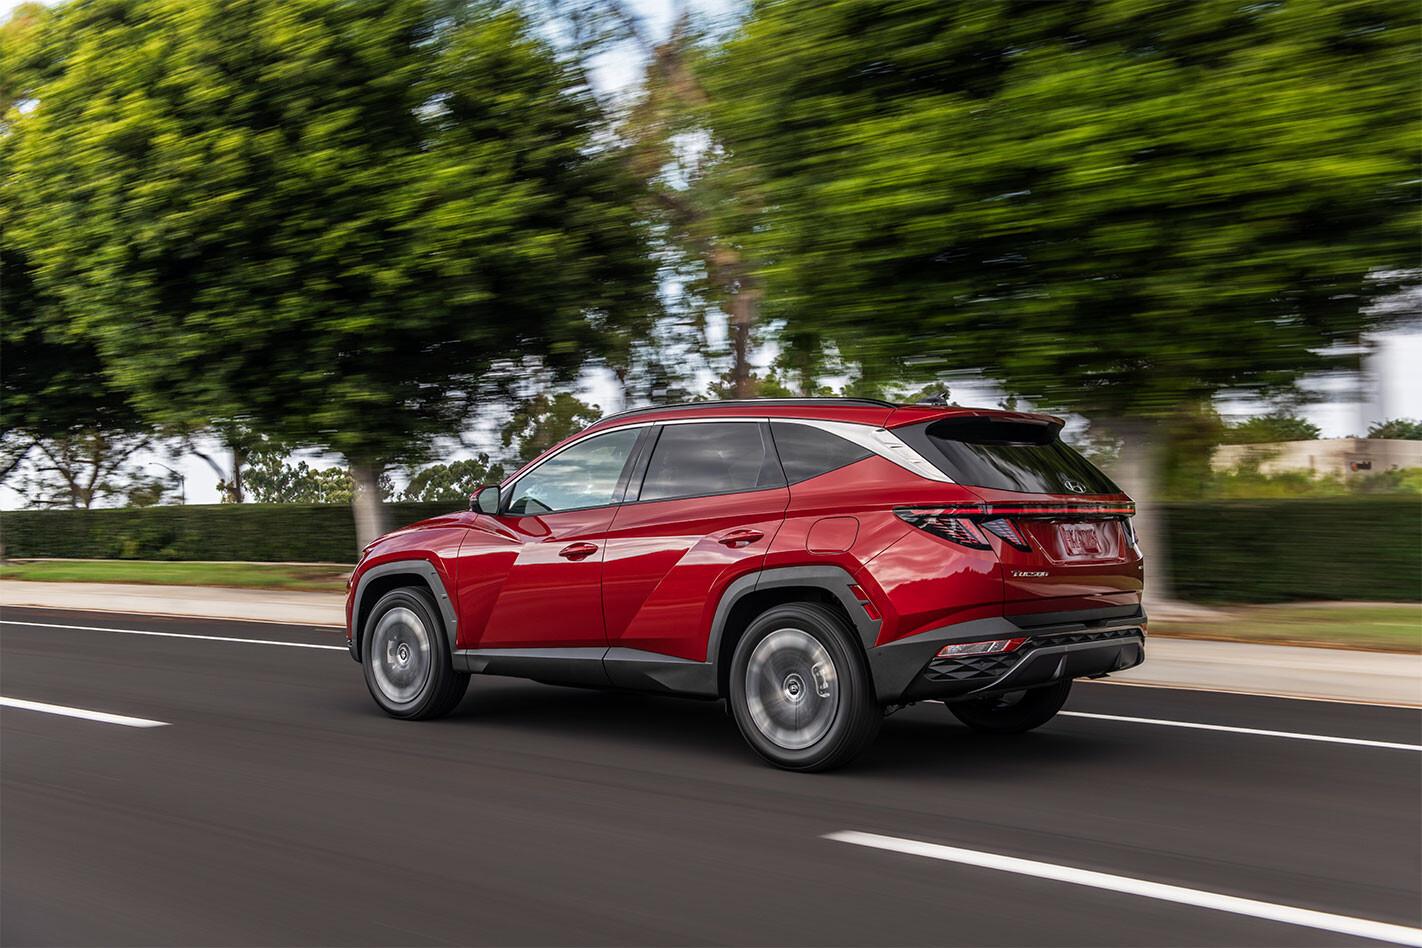 2021 Hyundai Tucson PHEV HEV